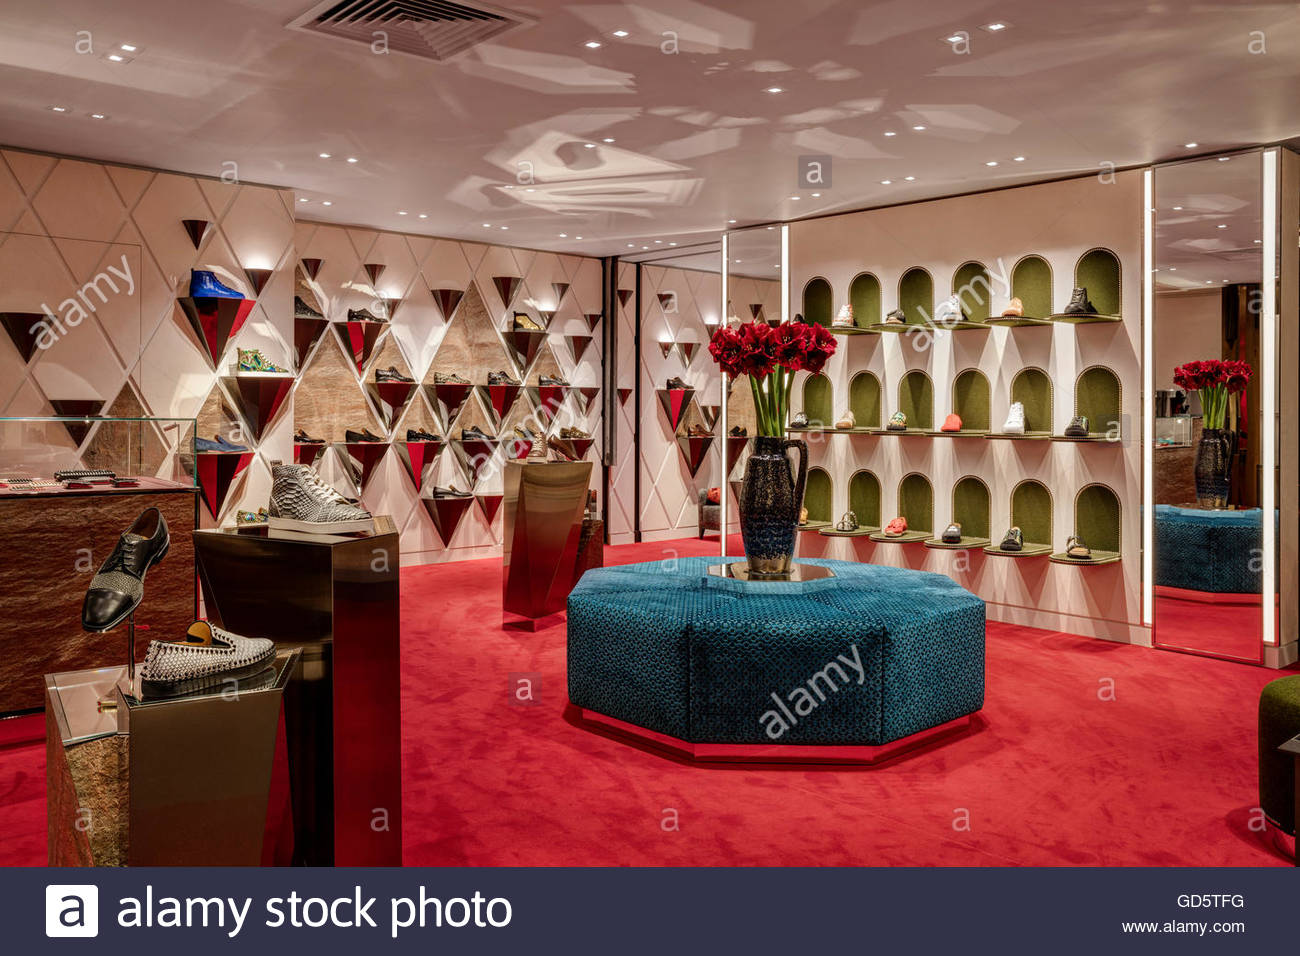 c6db1ad183f Store view. Christian Louboutin - Harrods, London, United Kingdom ...